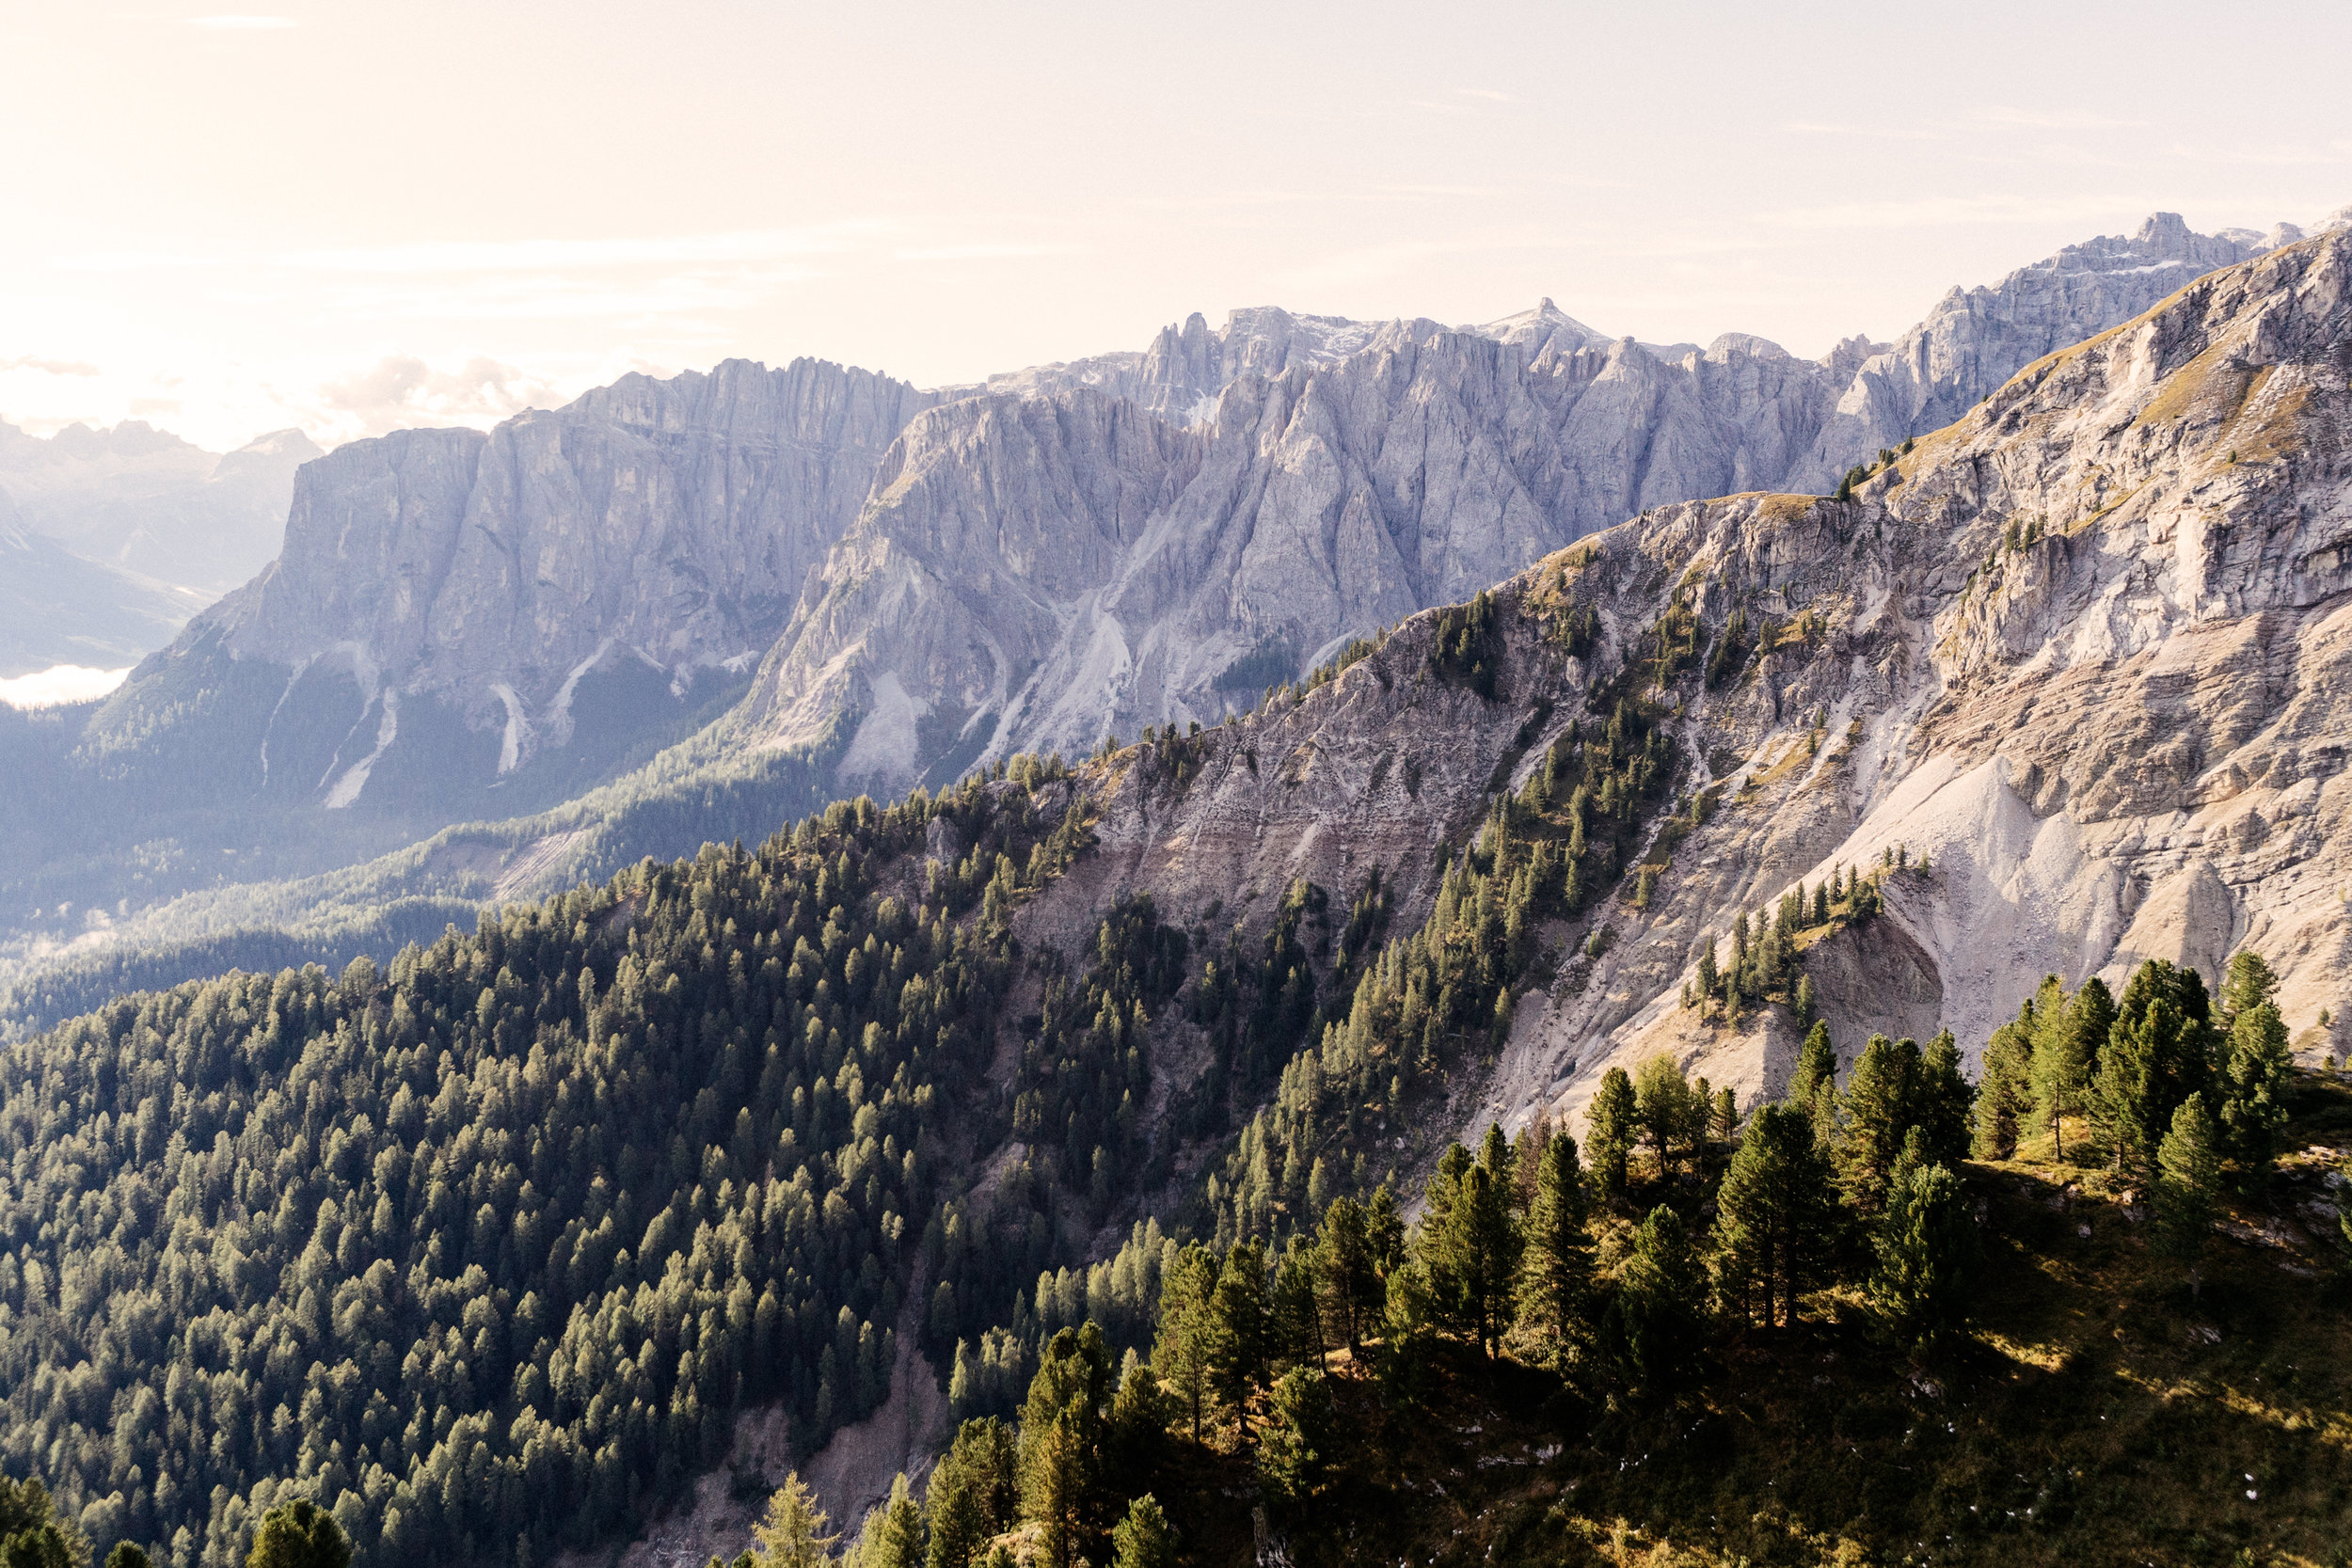 Dolomites-ChrisBrinleeJr-SEP17-117.jpg